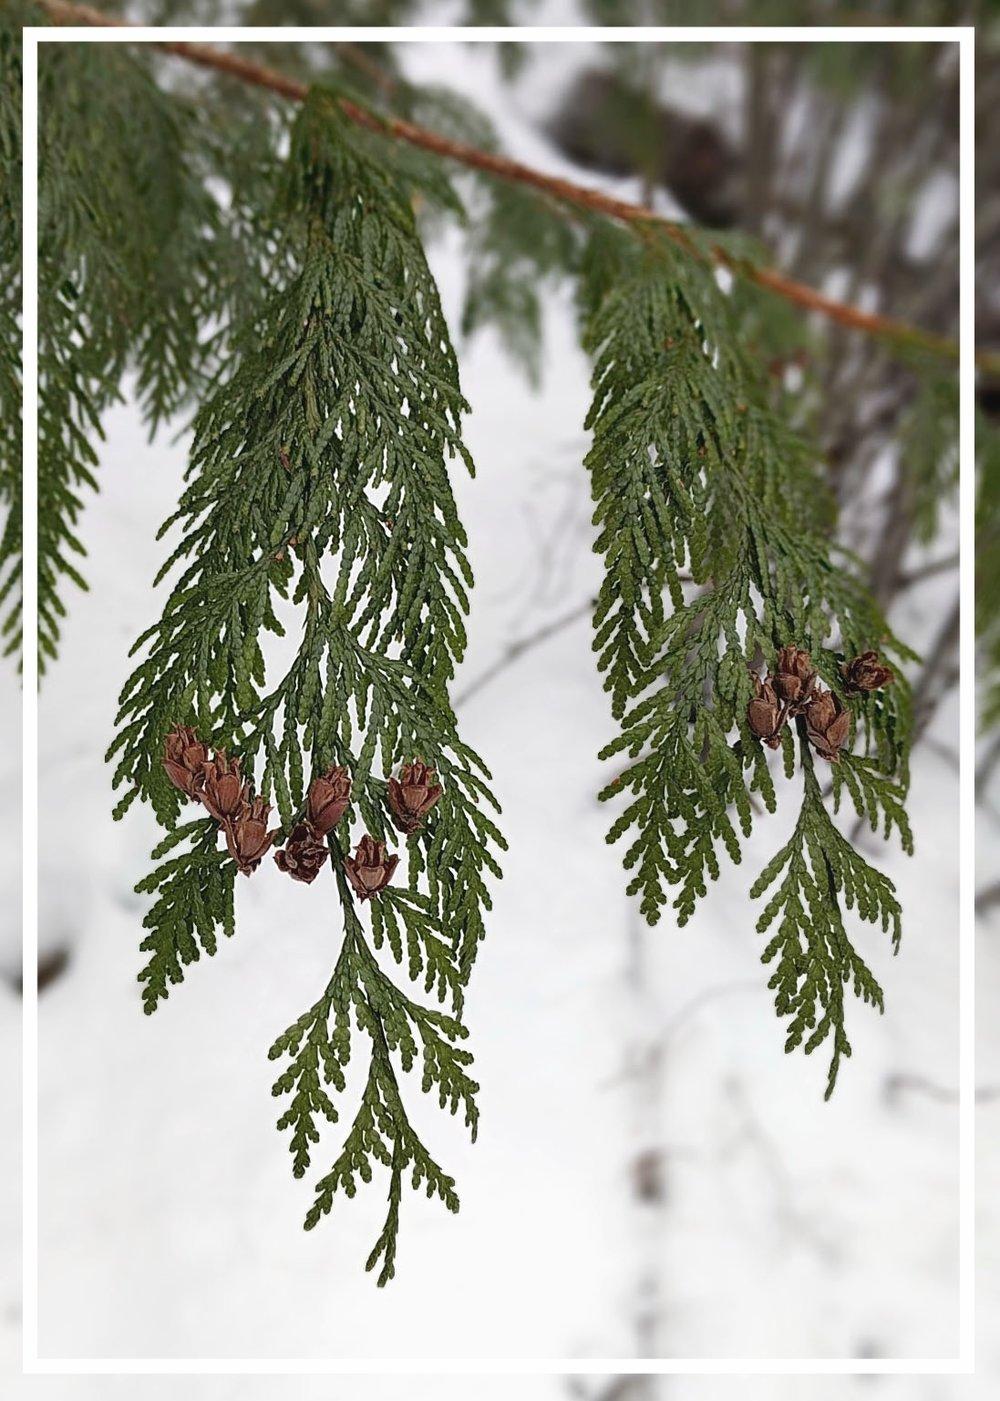 thuja-plicata-western-red-cedar.jpg